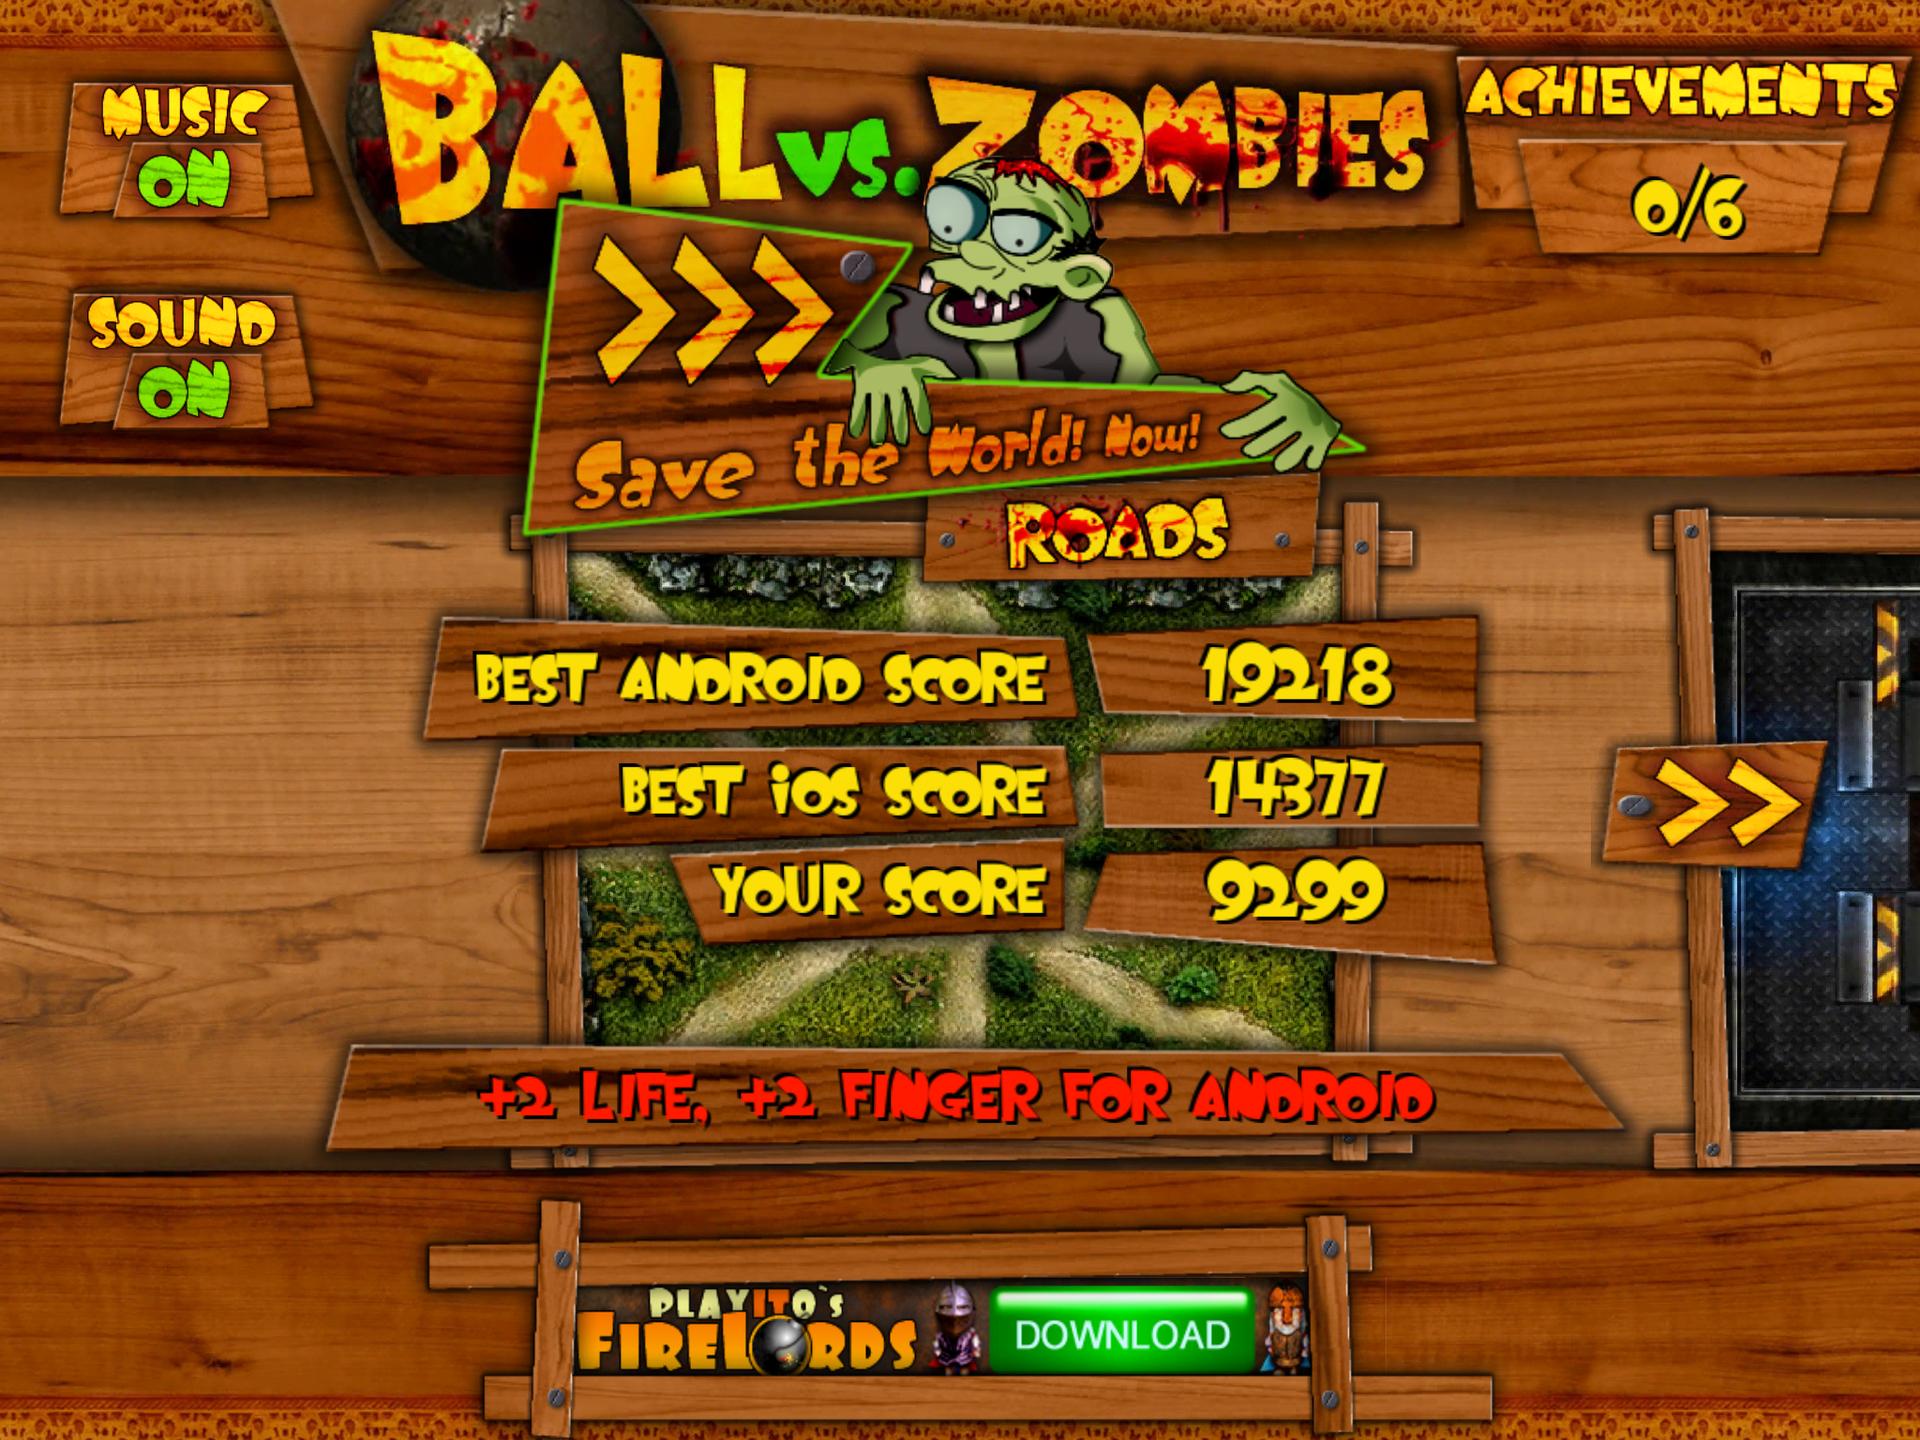 Ball vs. Zombies